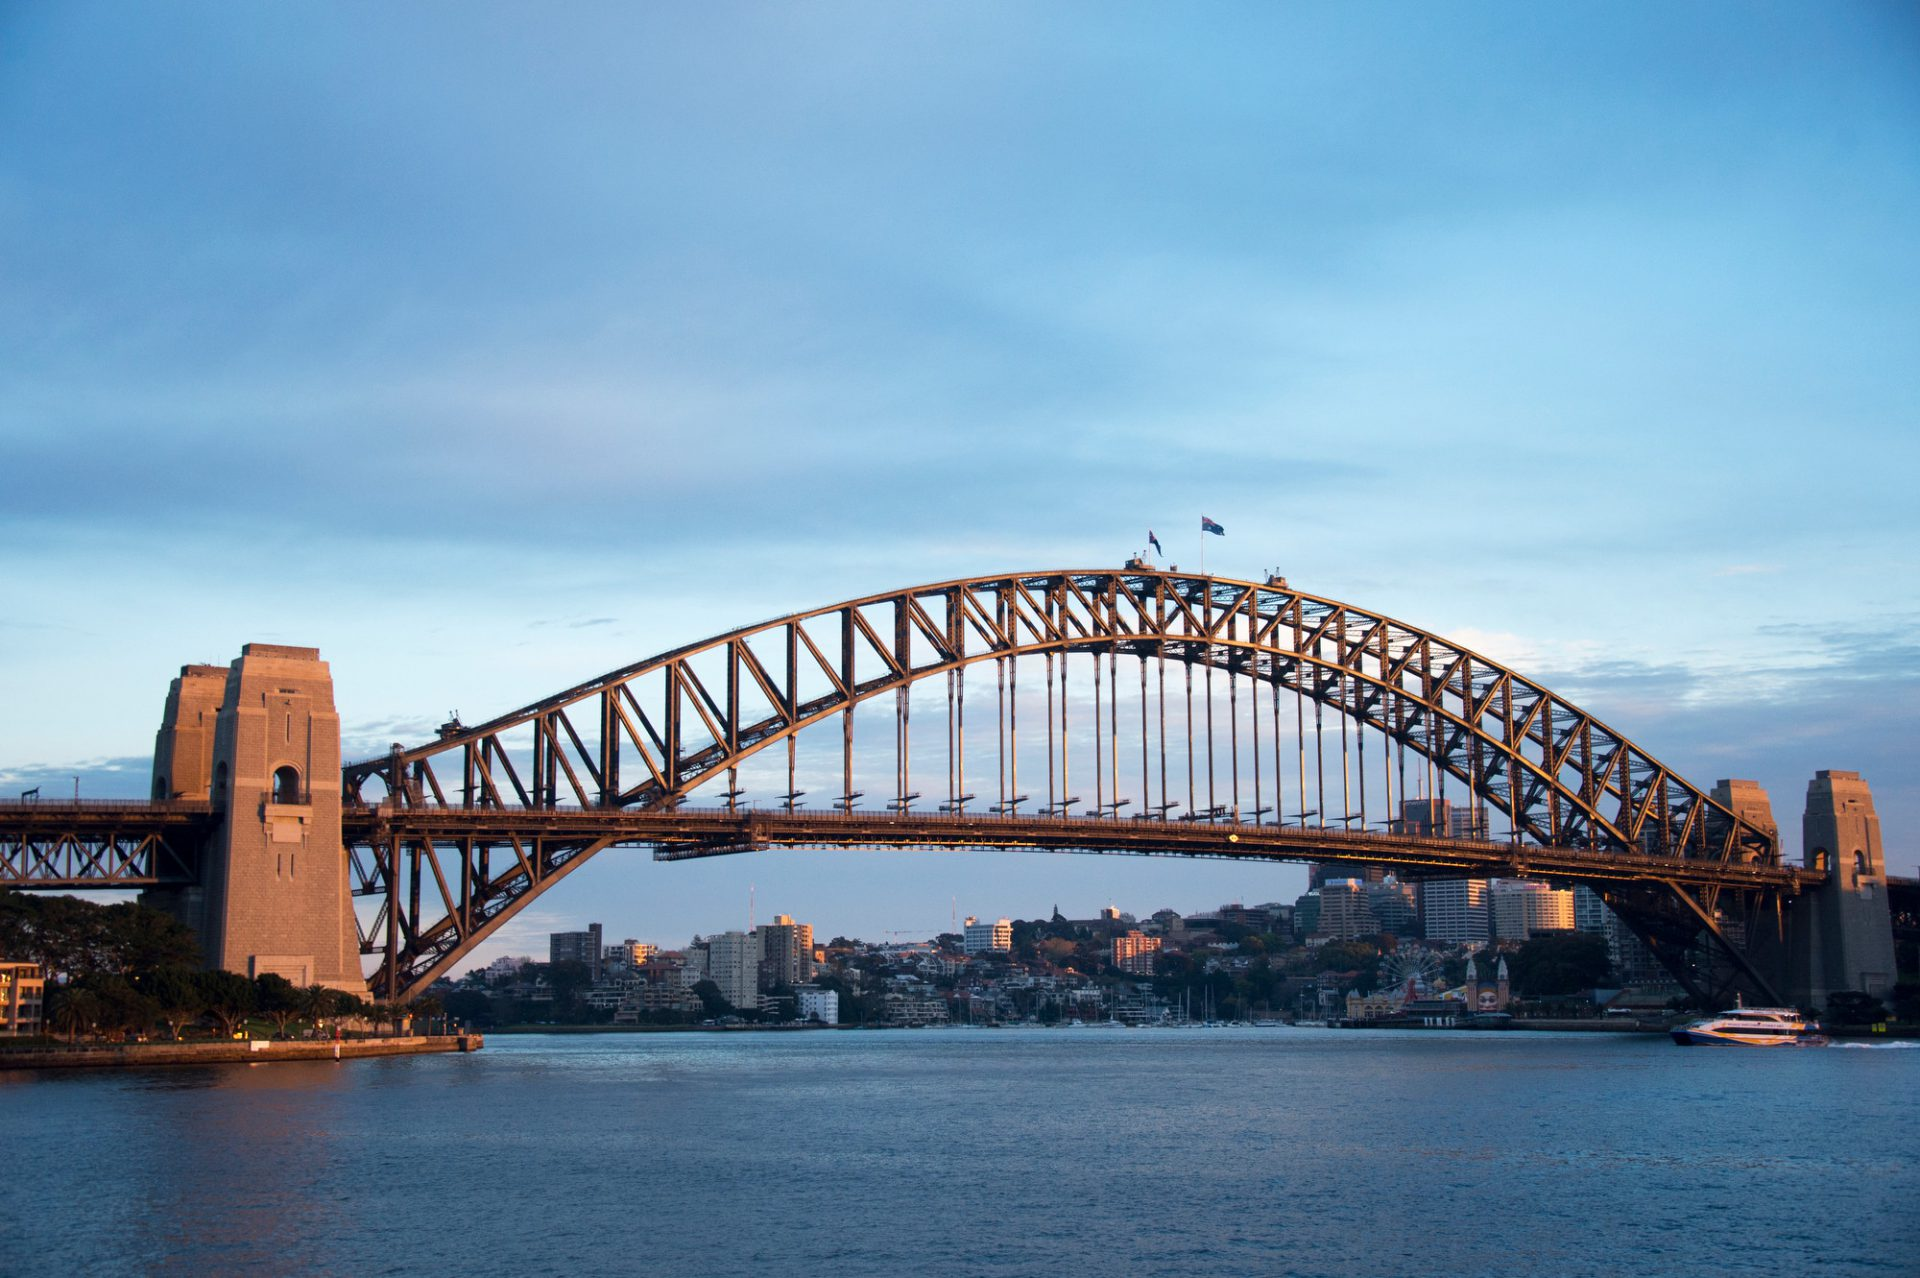 Photo: A bridge in Sydney, Australia.